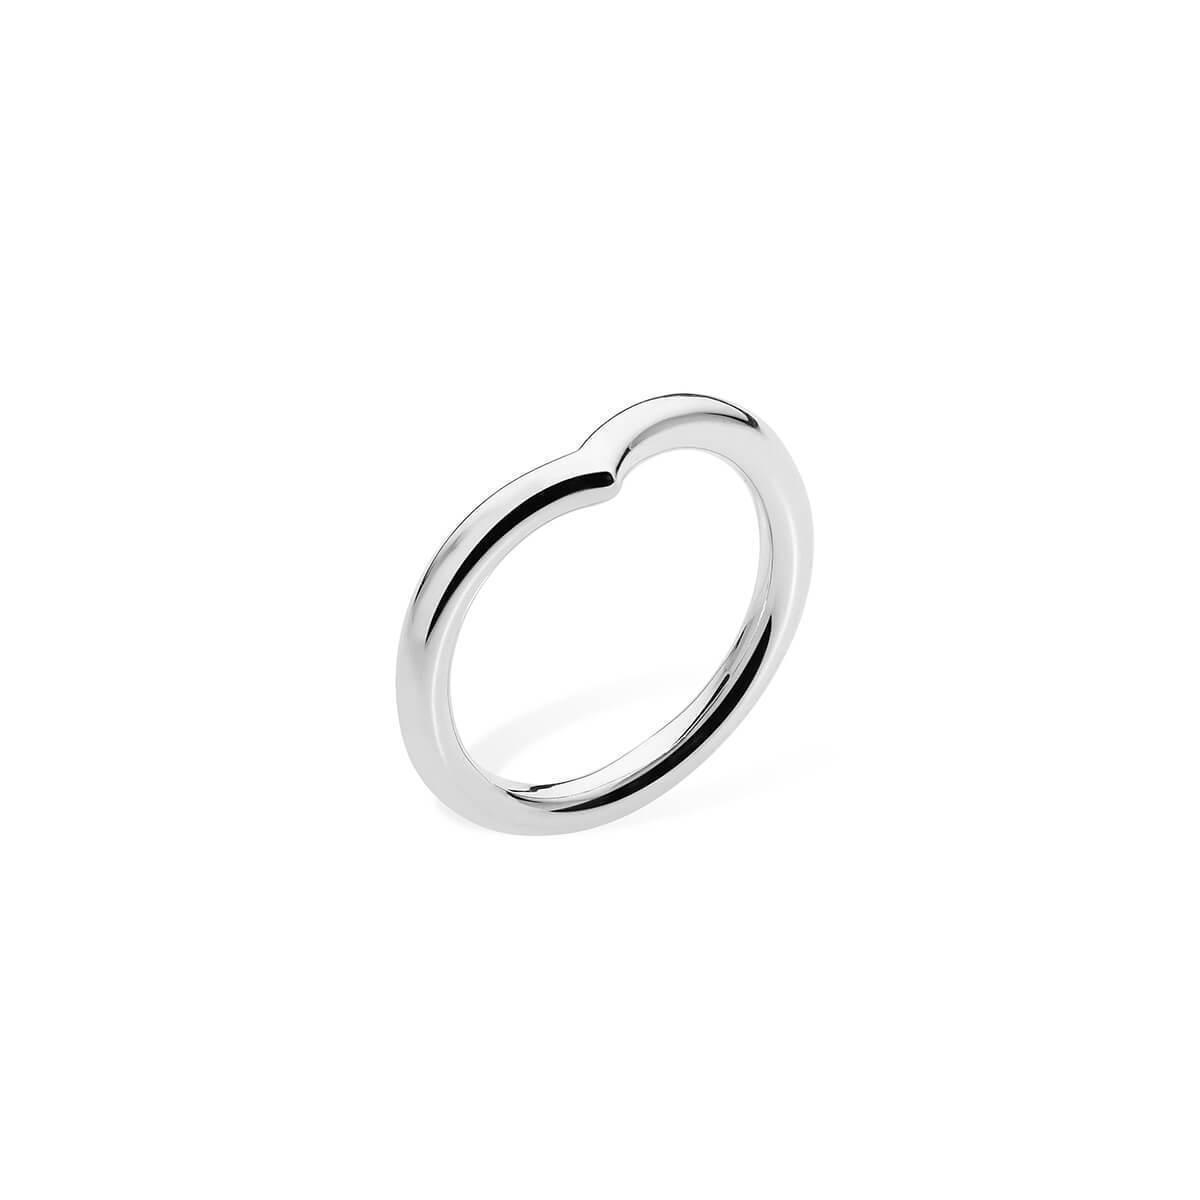 Lucy Quartermaine Coil Midi Ring - UK G - US 3 3/8 - EU 45 1/4 mQ1aNQl